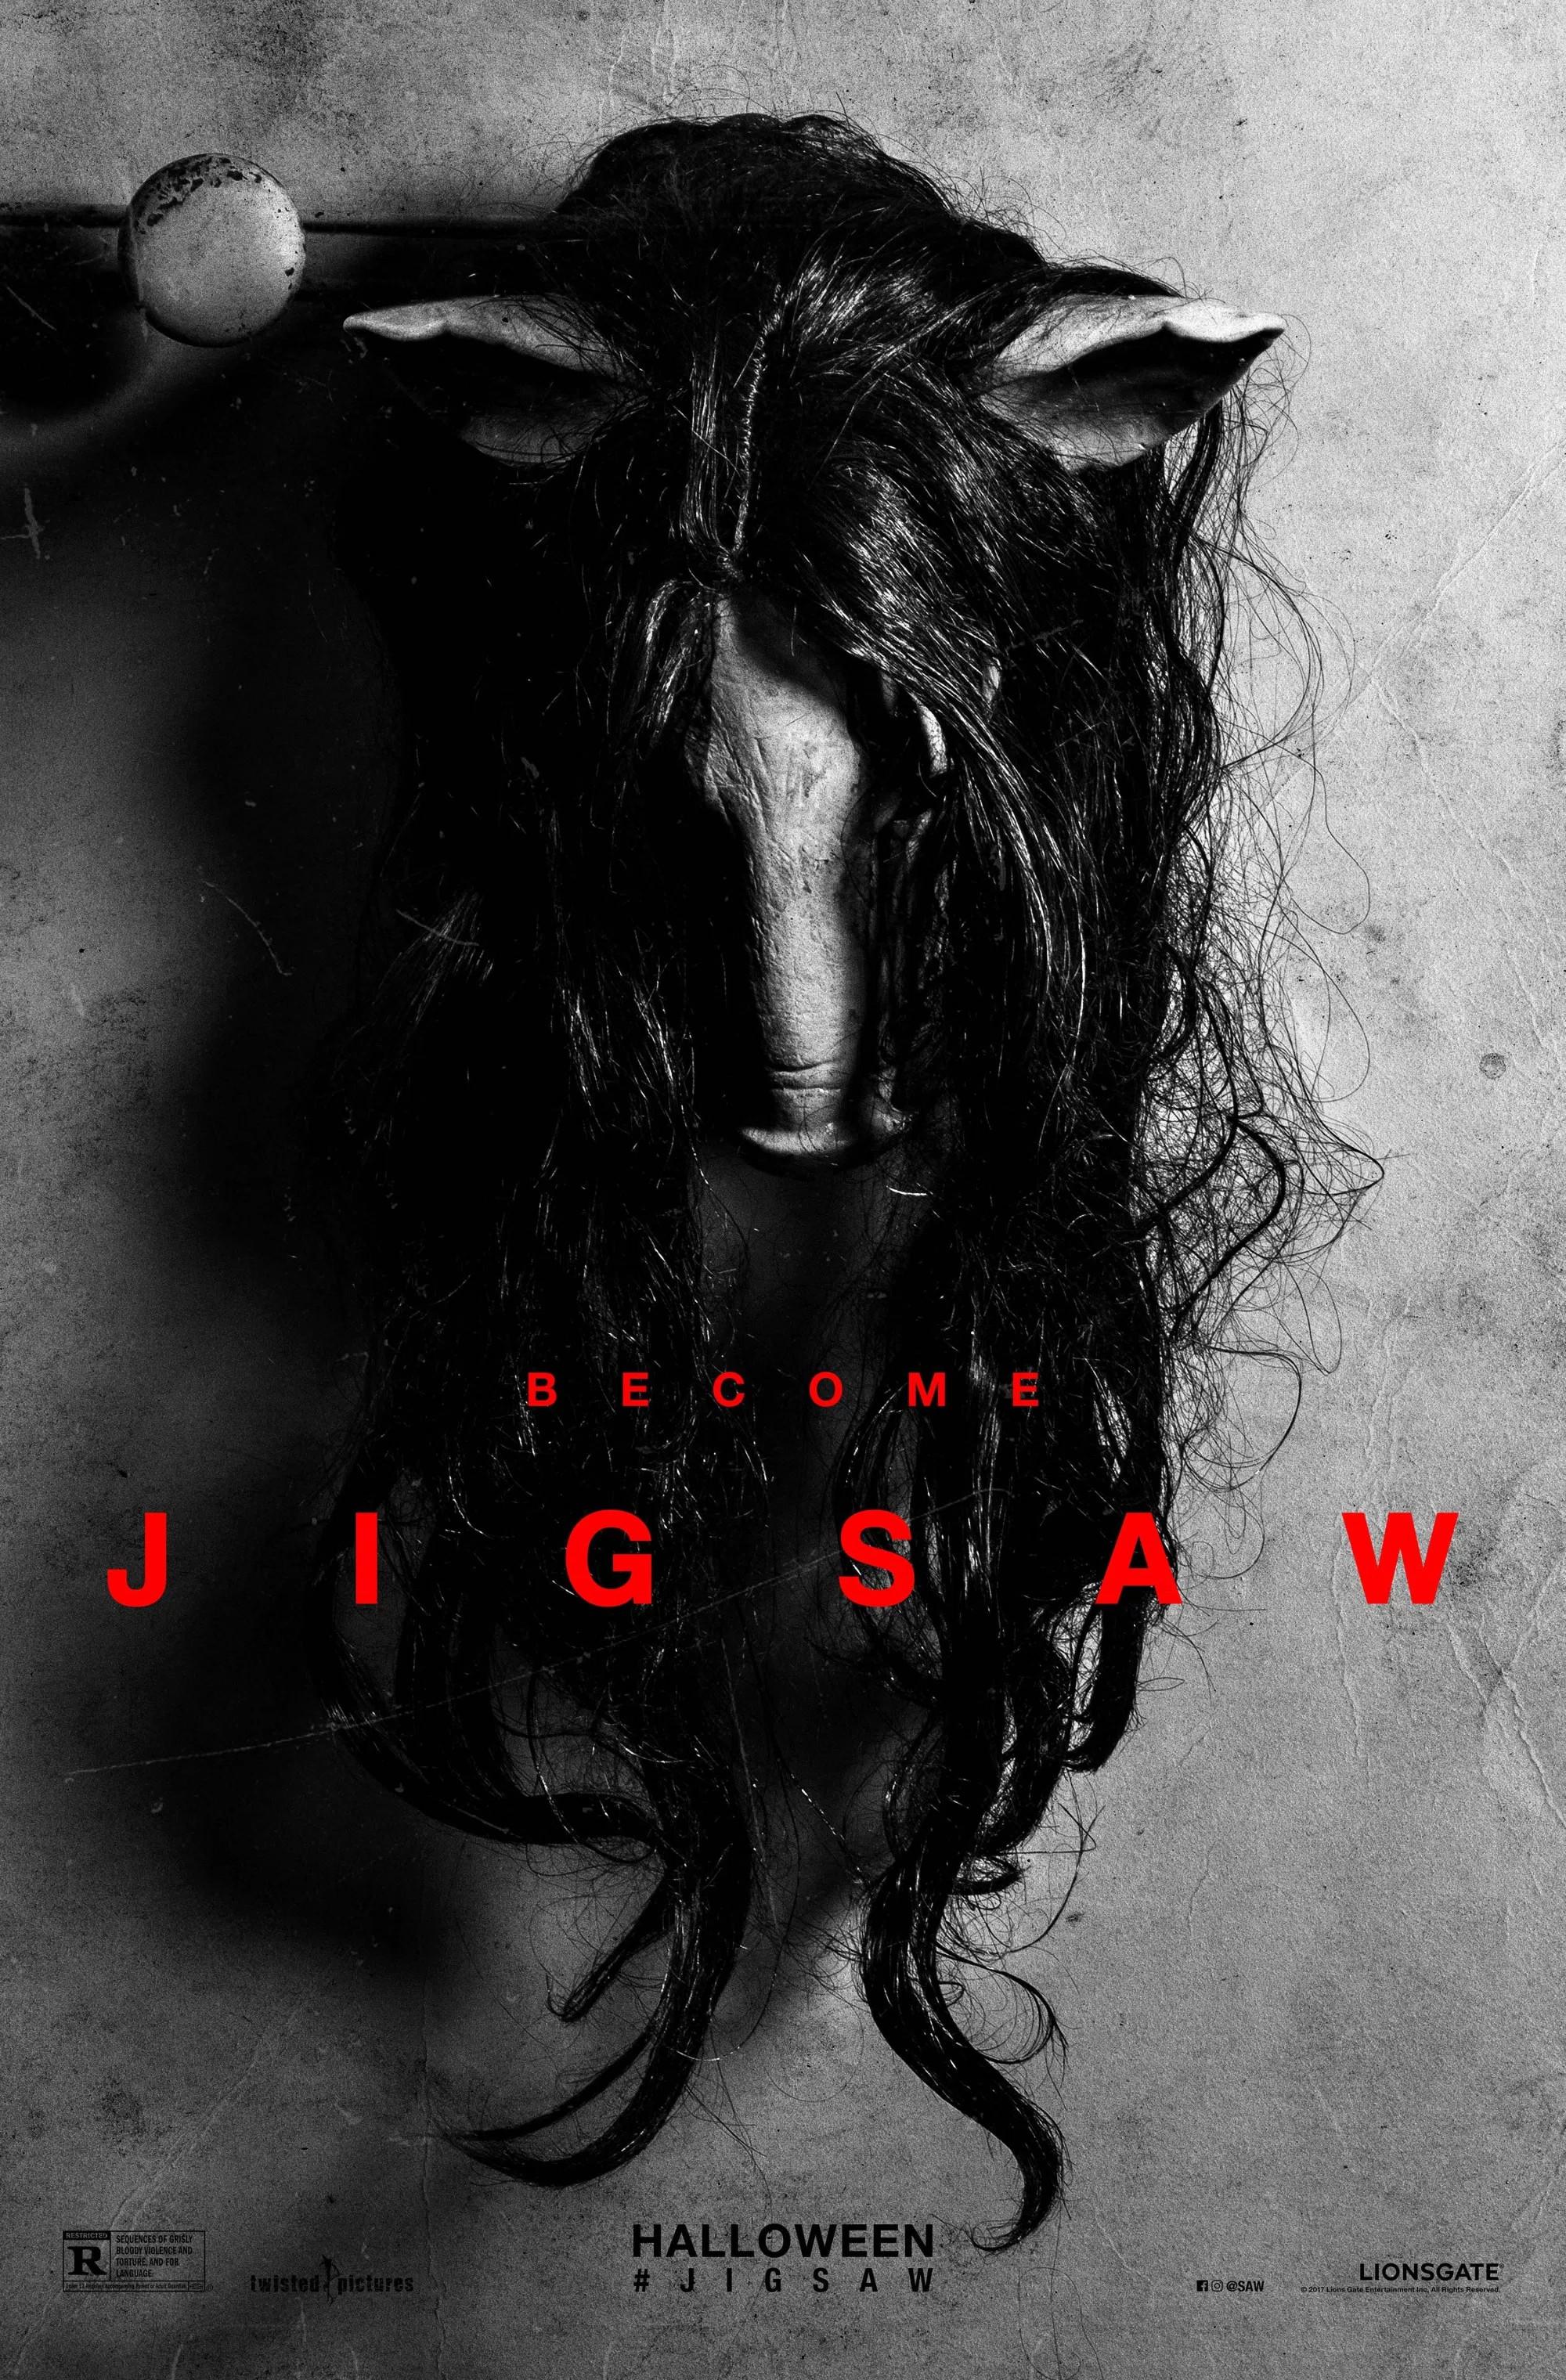 Updated! Έρχεται το SAW 8: Ο Jigsaw επιστρέφει στην πιο σκληρή εκδοχή του (Pics & Vids)